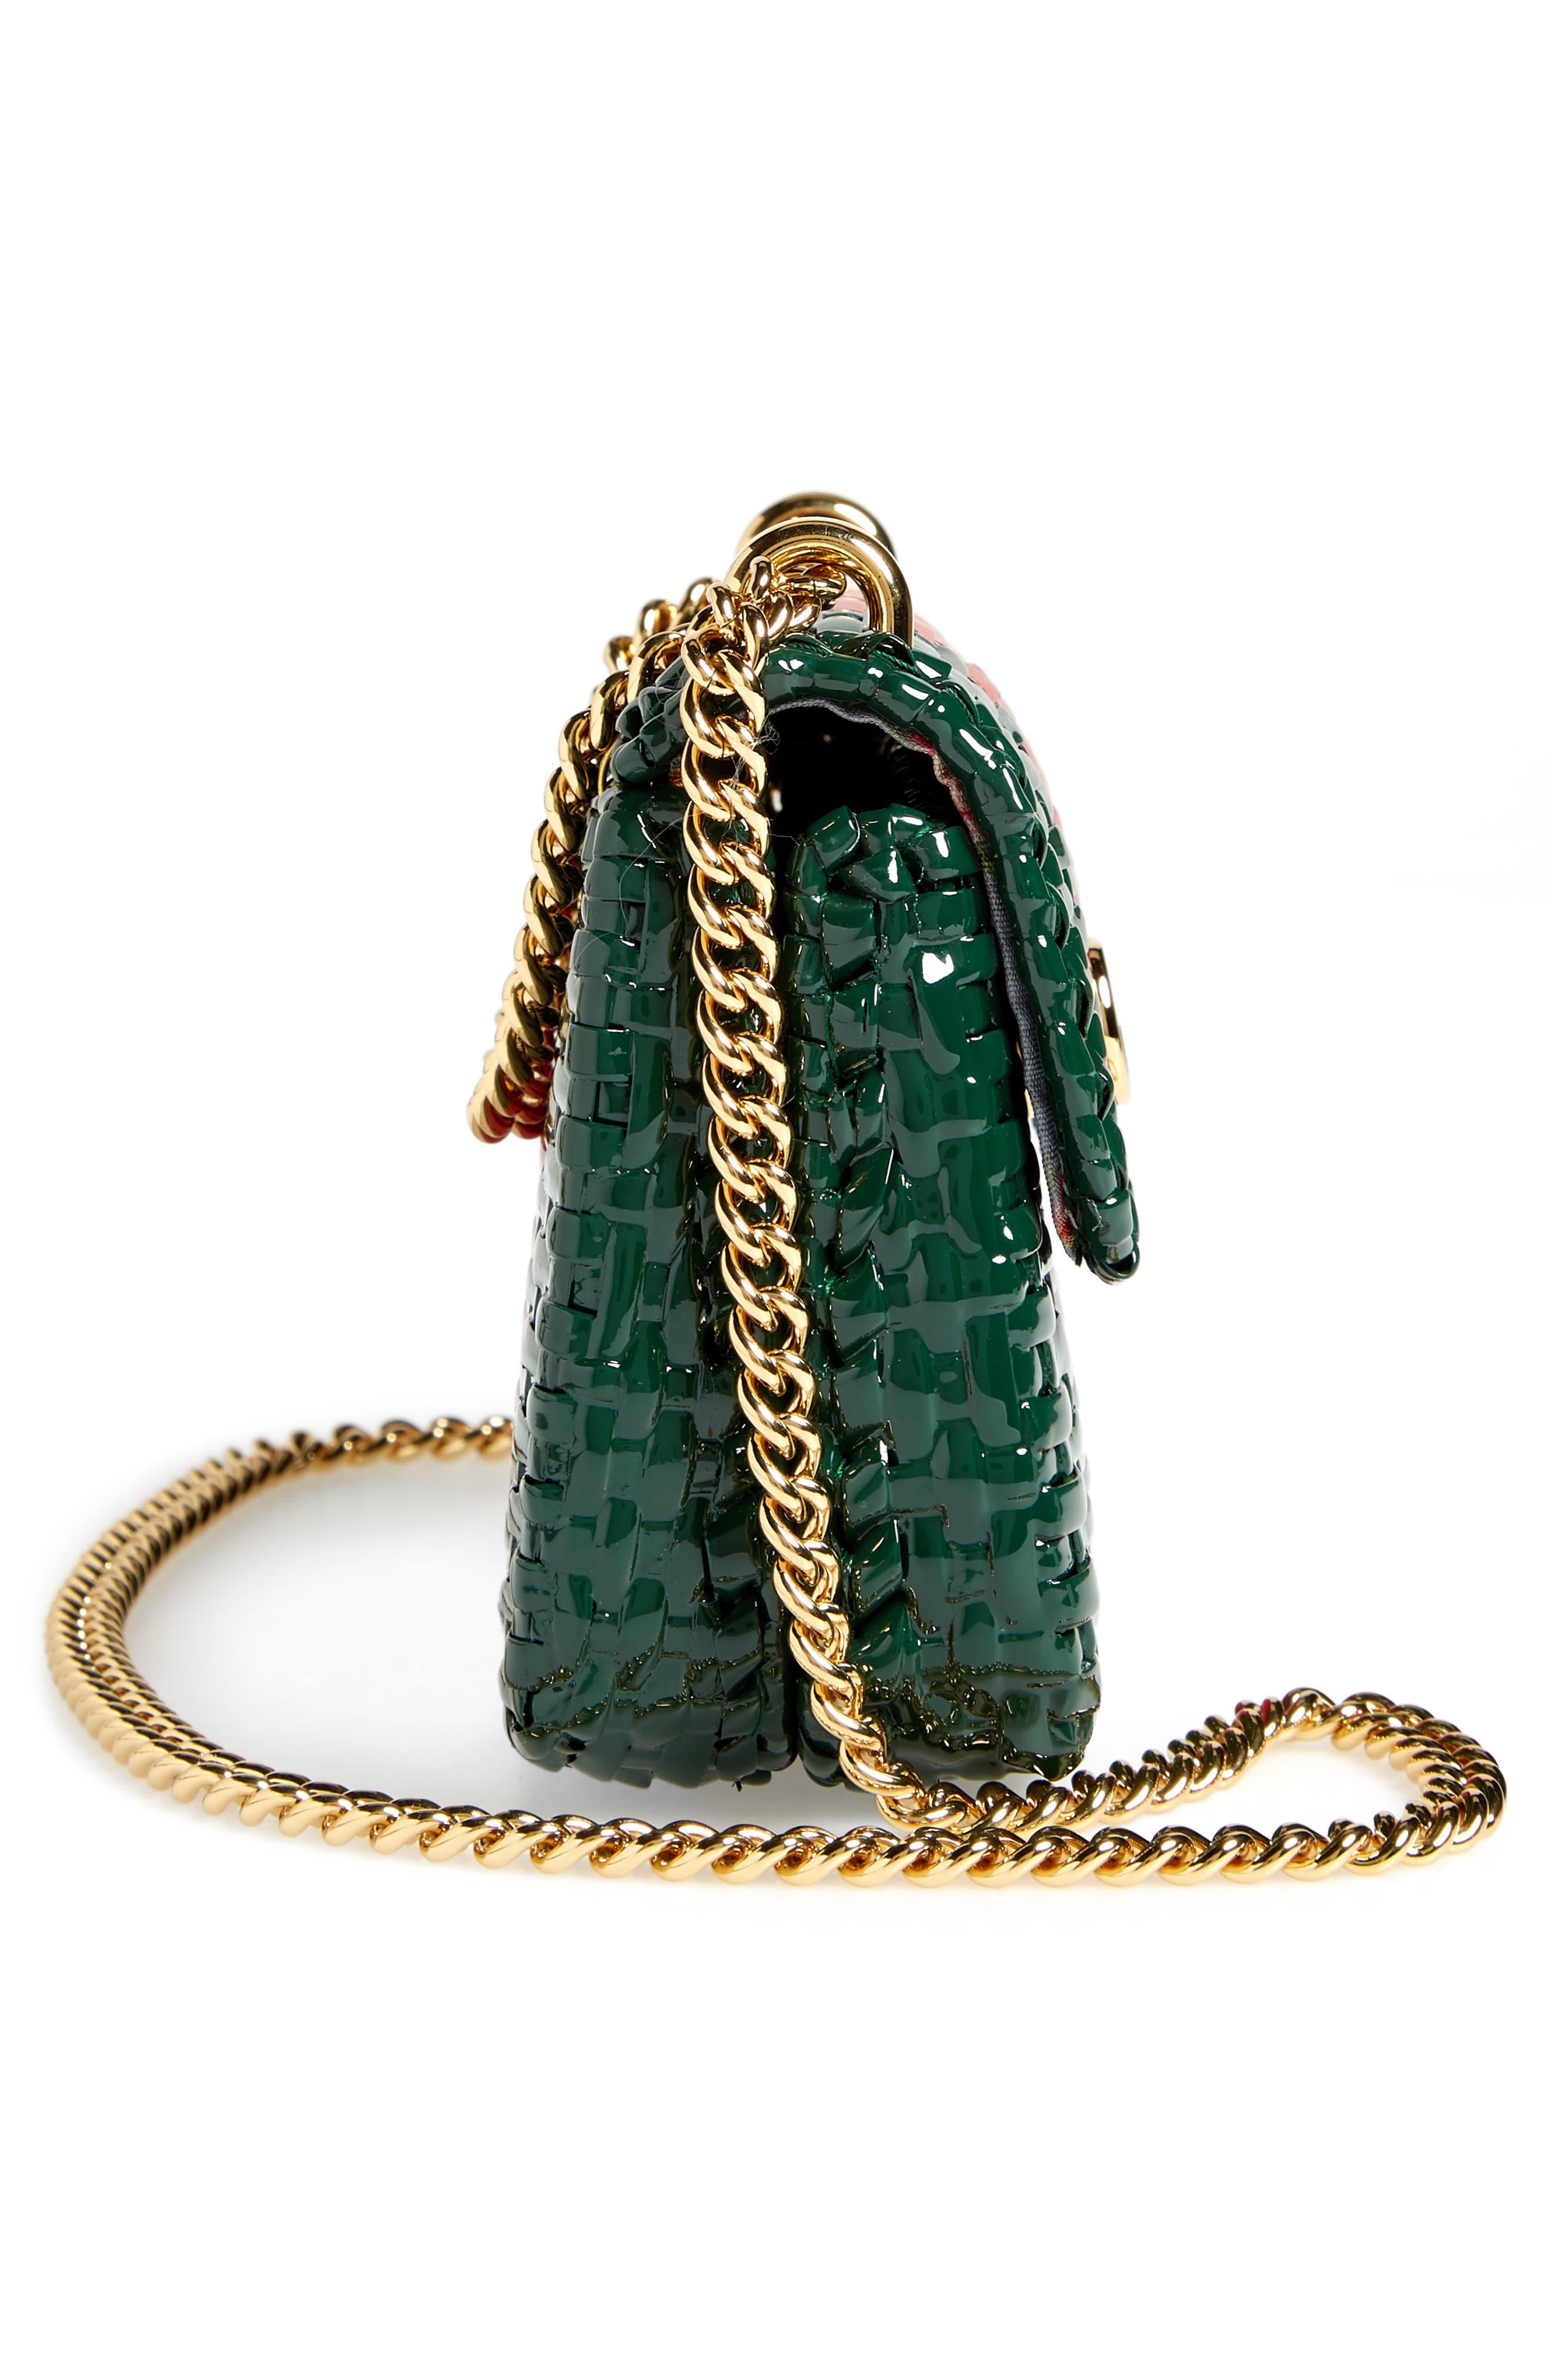 Small Linea Cestino Glazed Wicker Shoulder Bag,                             Alternate thumbnail 5, color,                             VERDE ROSSO VERDE